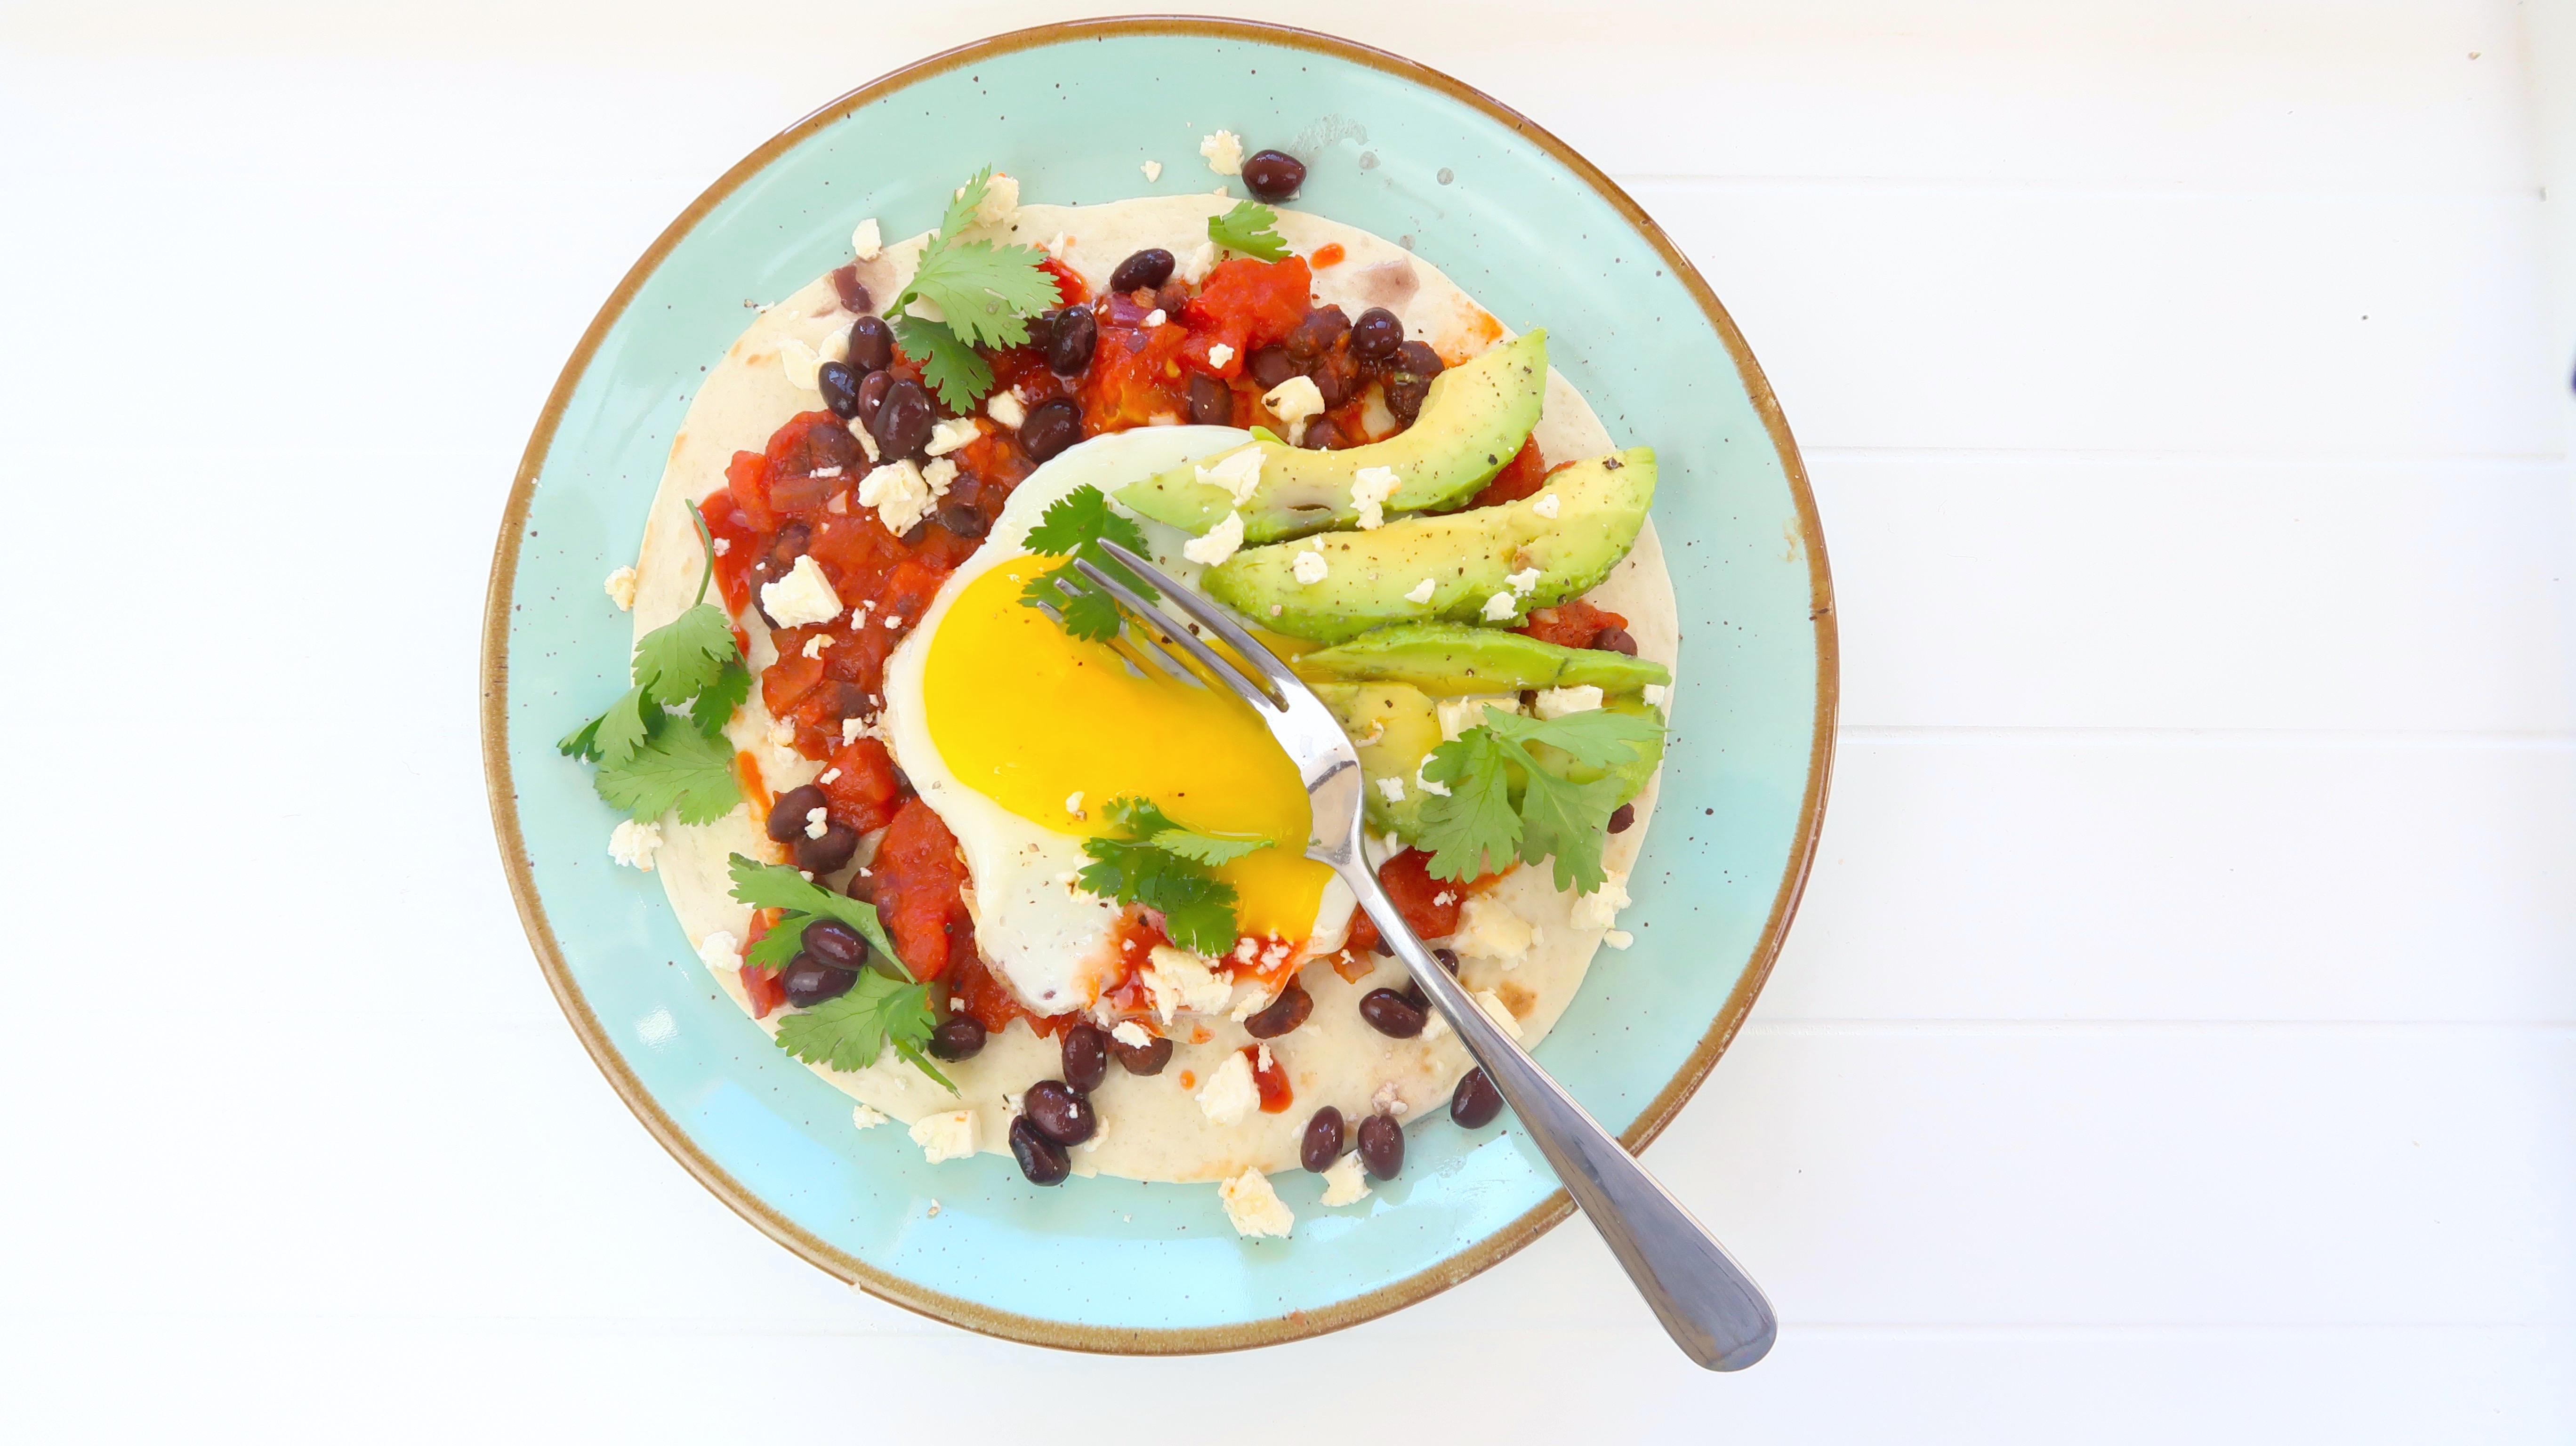 Mexikanisches Frühstück: Huevos Rancheros